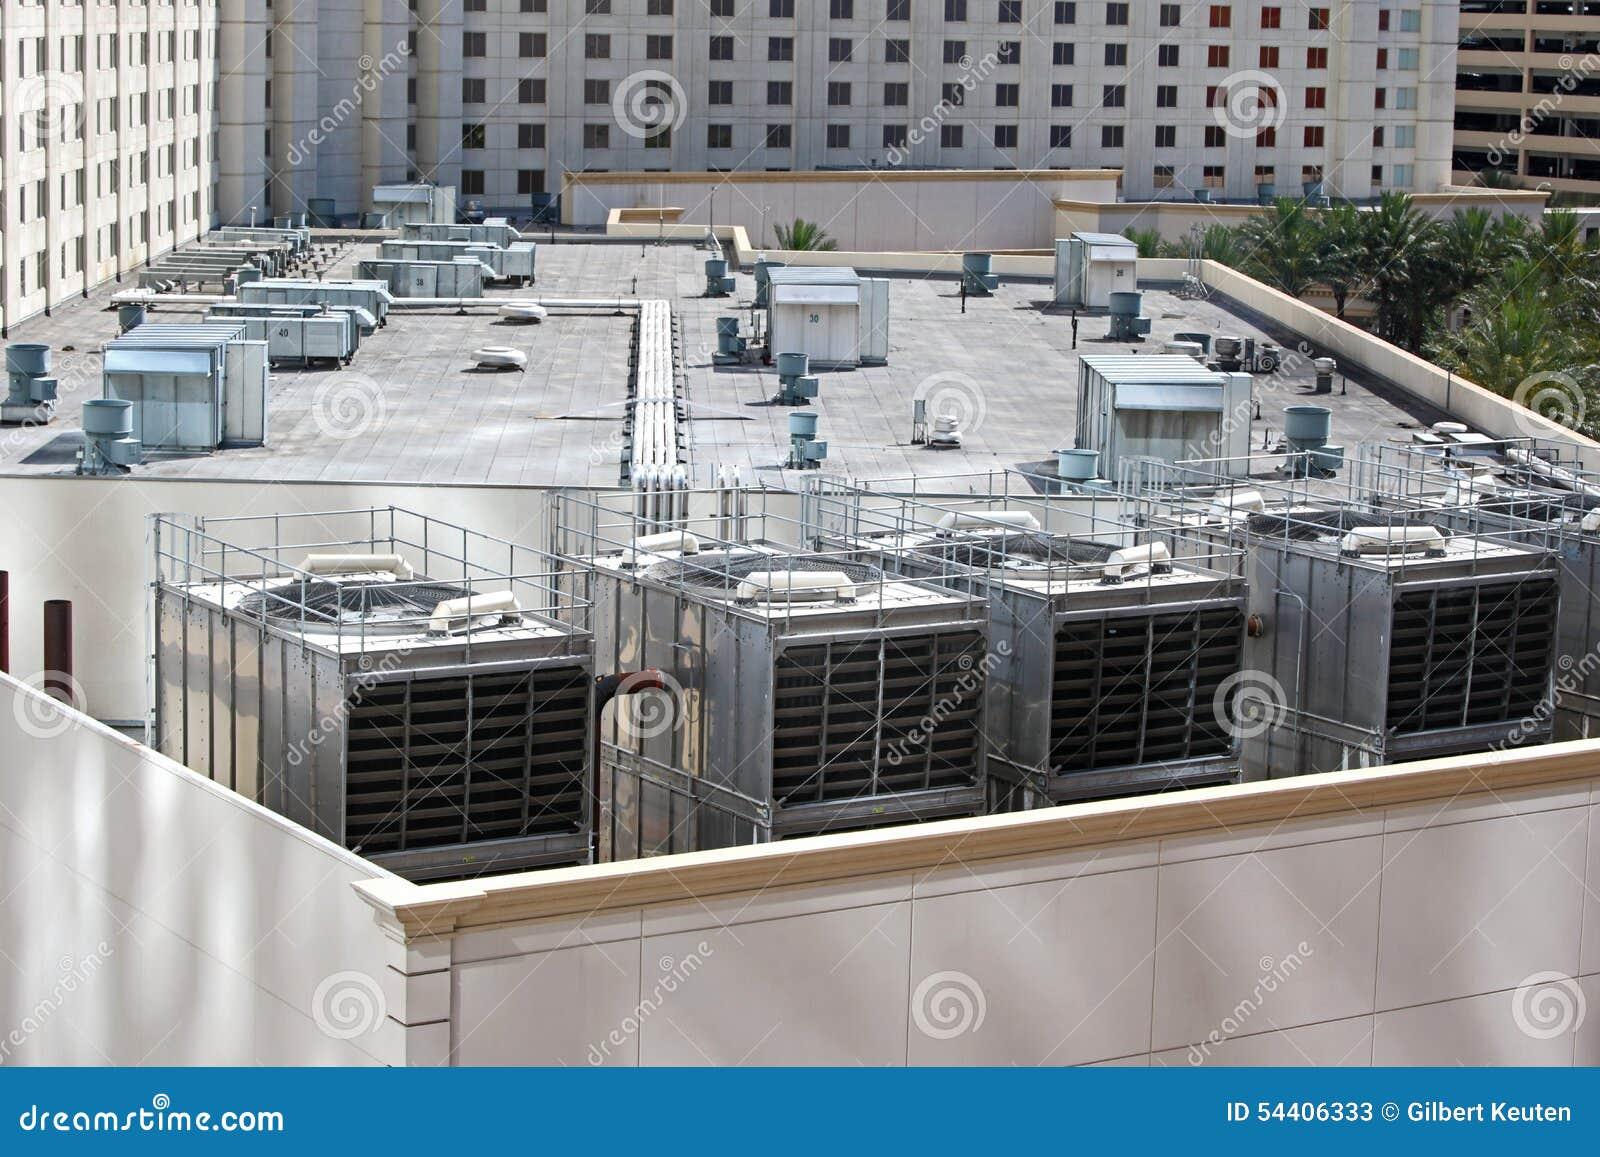 Casino Rooftop Stock Photo - Image: 54406333